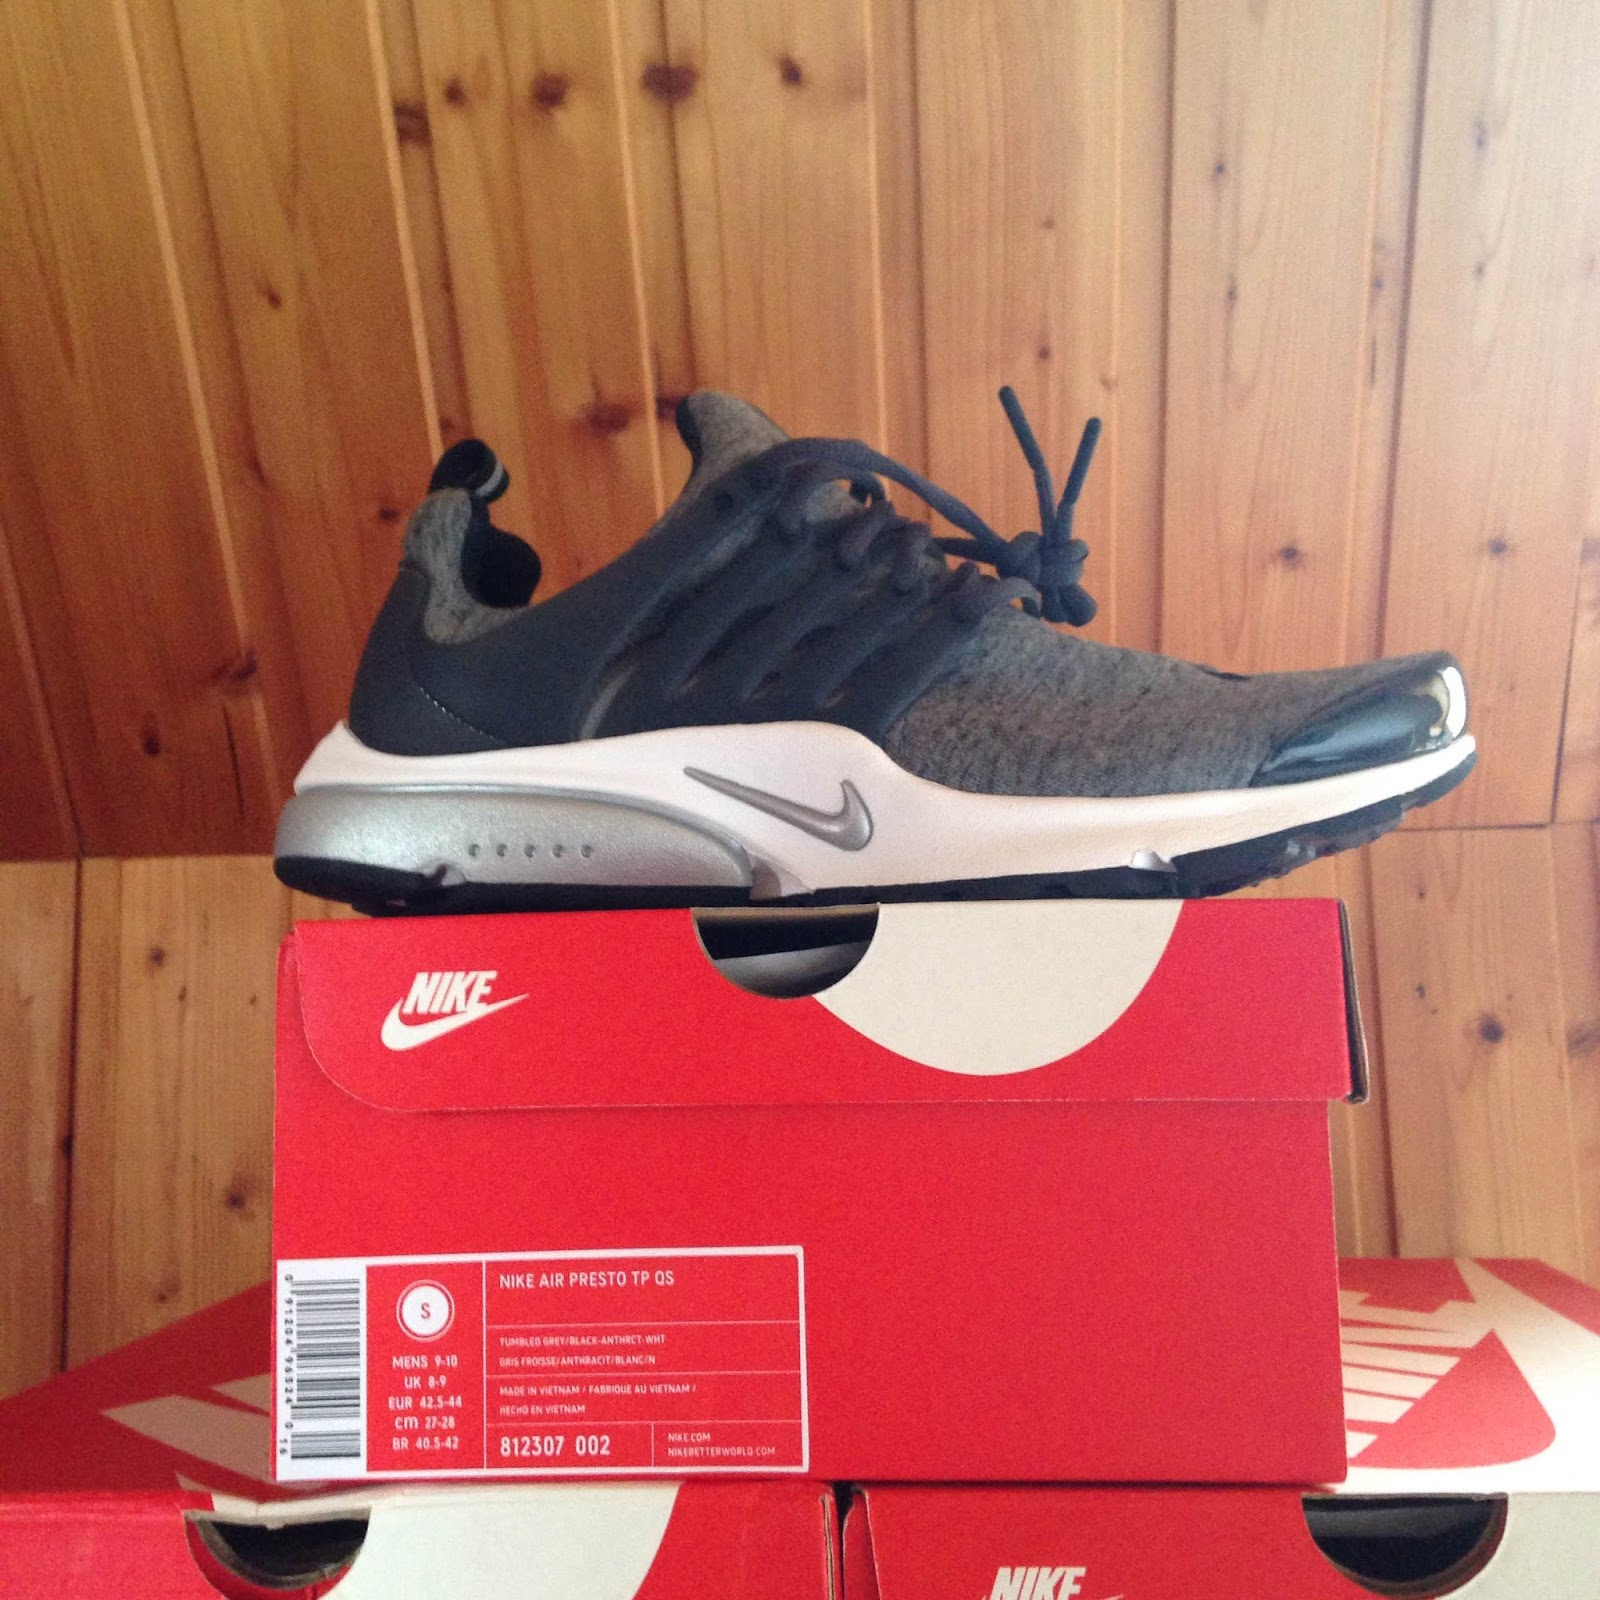 985bdef3df3b recordselling  Nike Air Presto TP QS Fleece Tech Pack Grey (812307-002) OG  new w  box deadstock